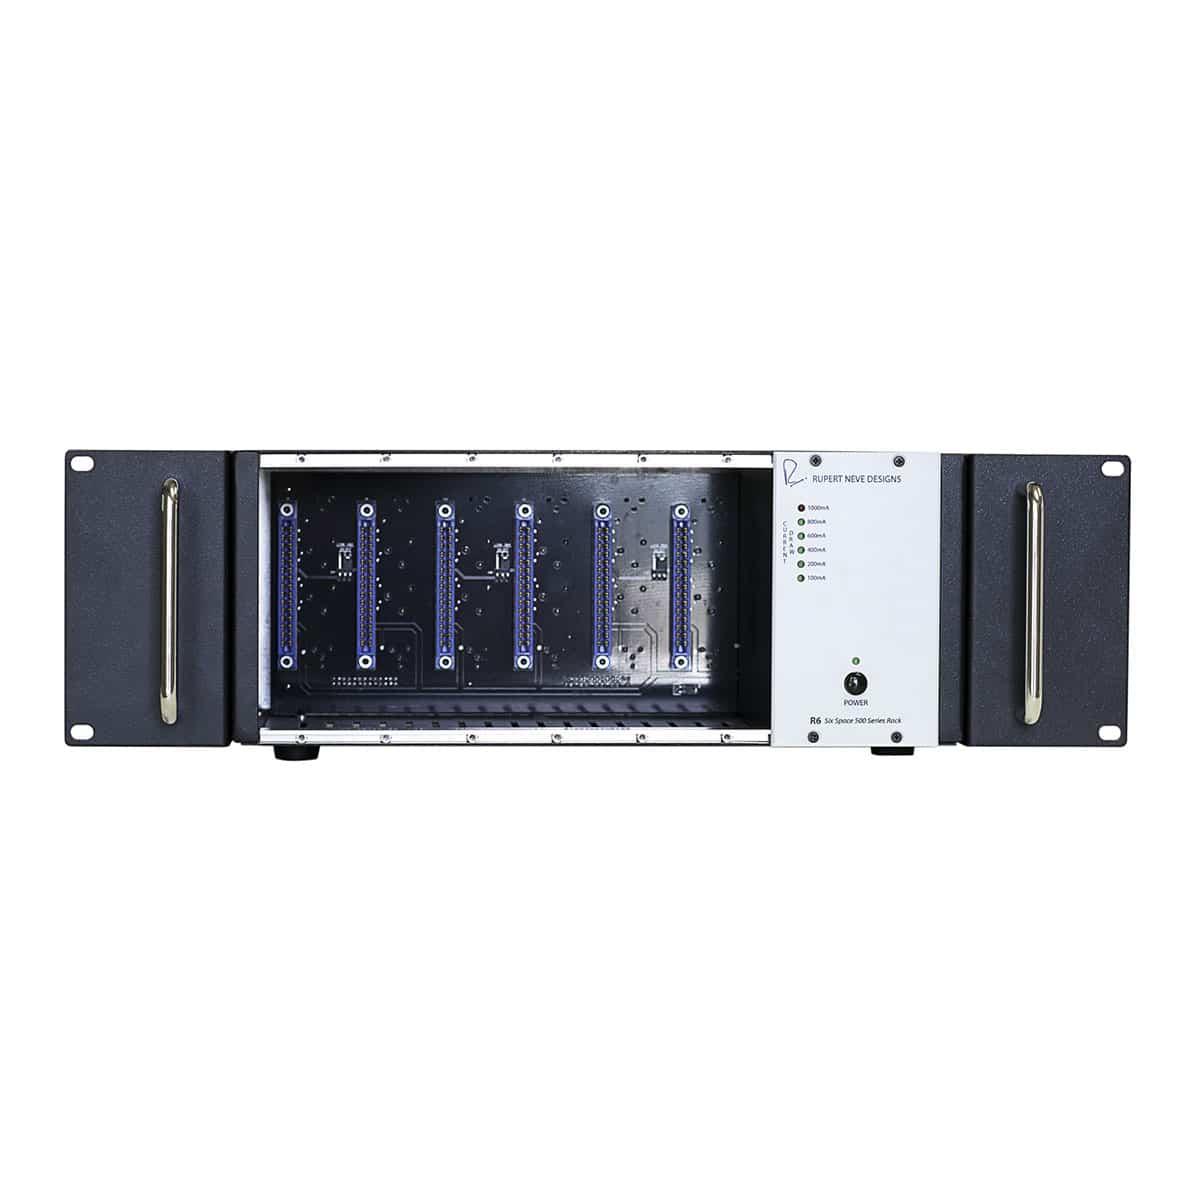 Rupert Neve R6 Six Space 500 Series Rack Pro Audio, Accessori, Lunchbox Rupert Neve R6 06